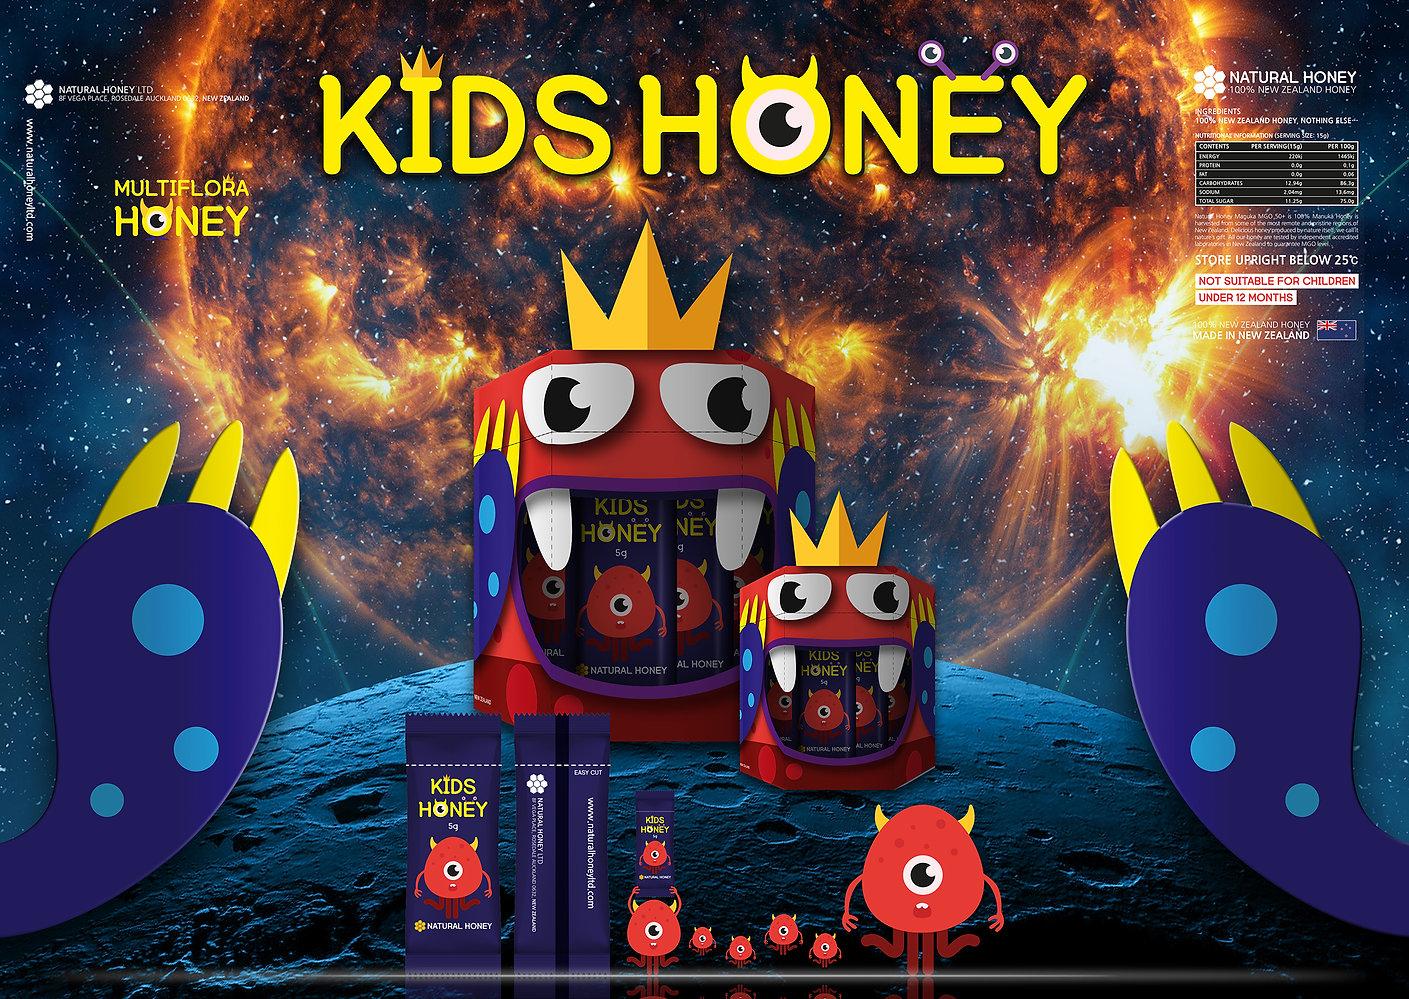 Natural Honey Ltd-Kids Honey Concept Design